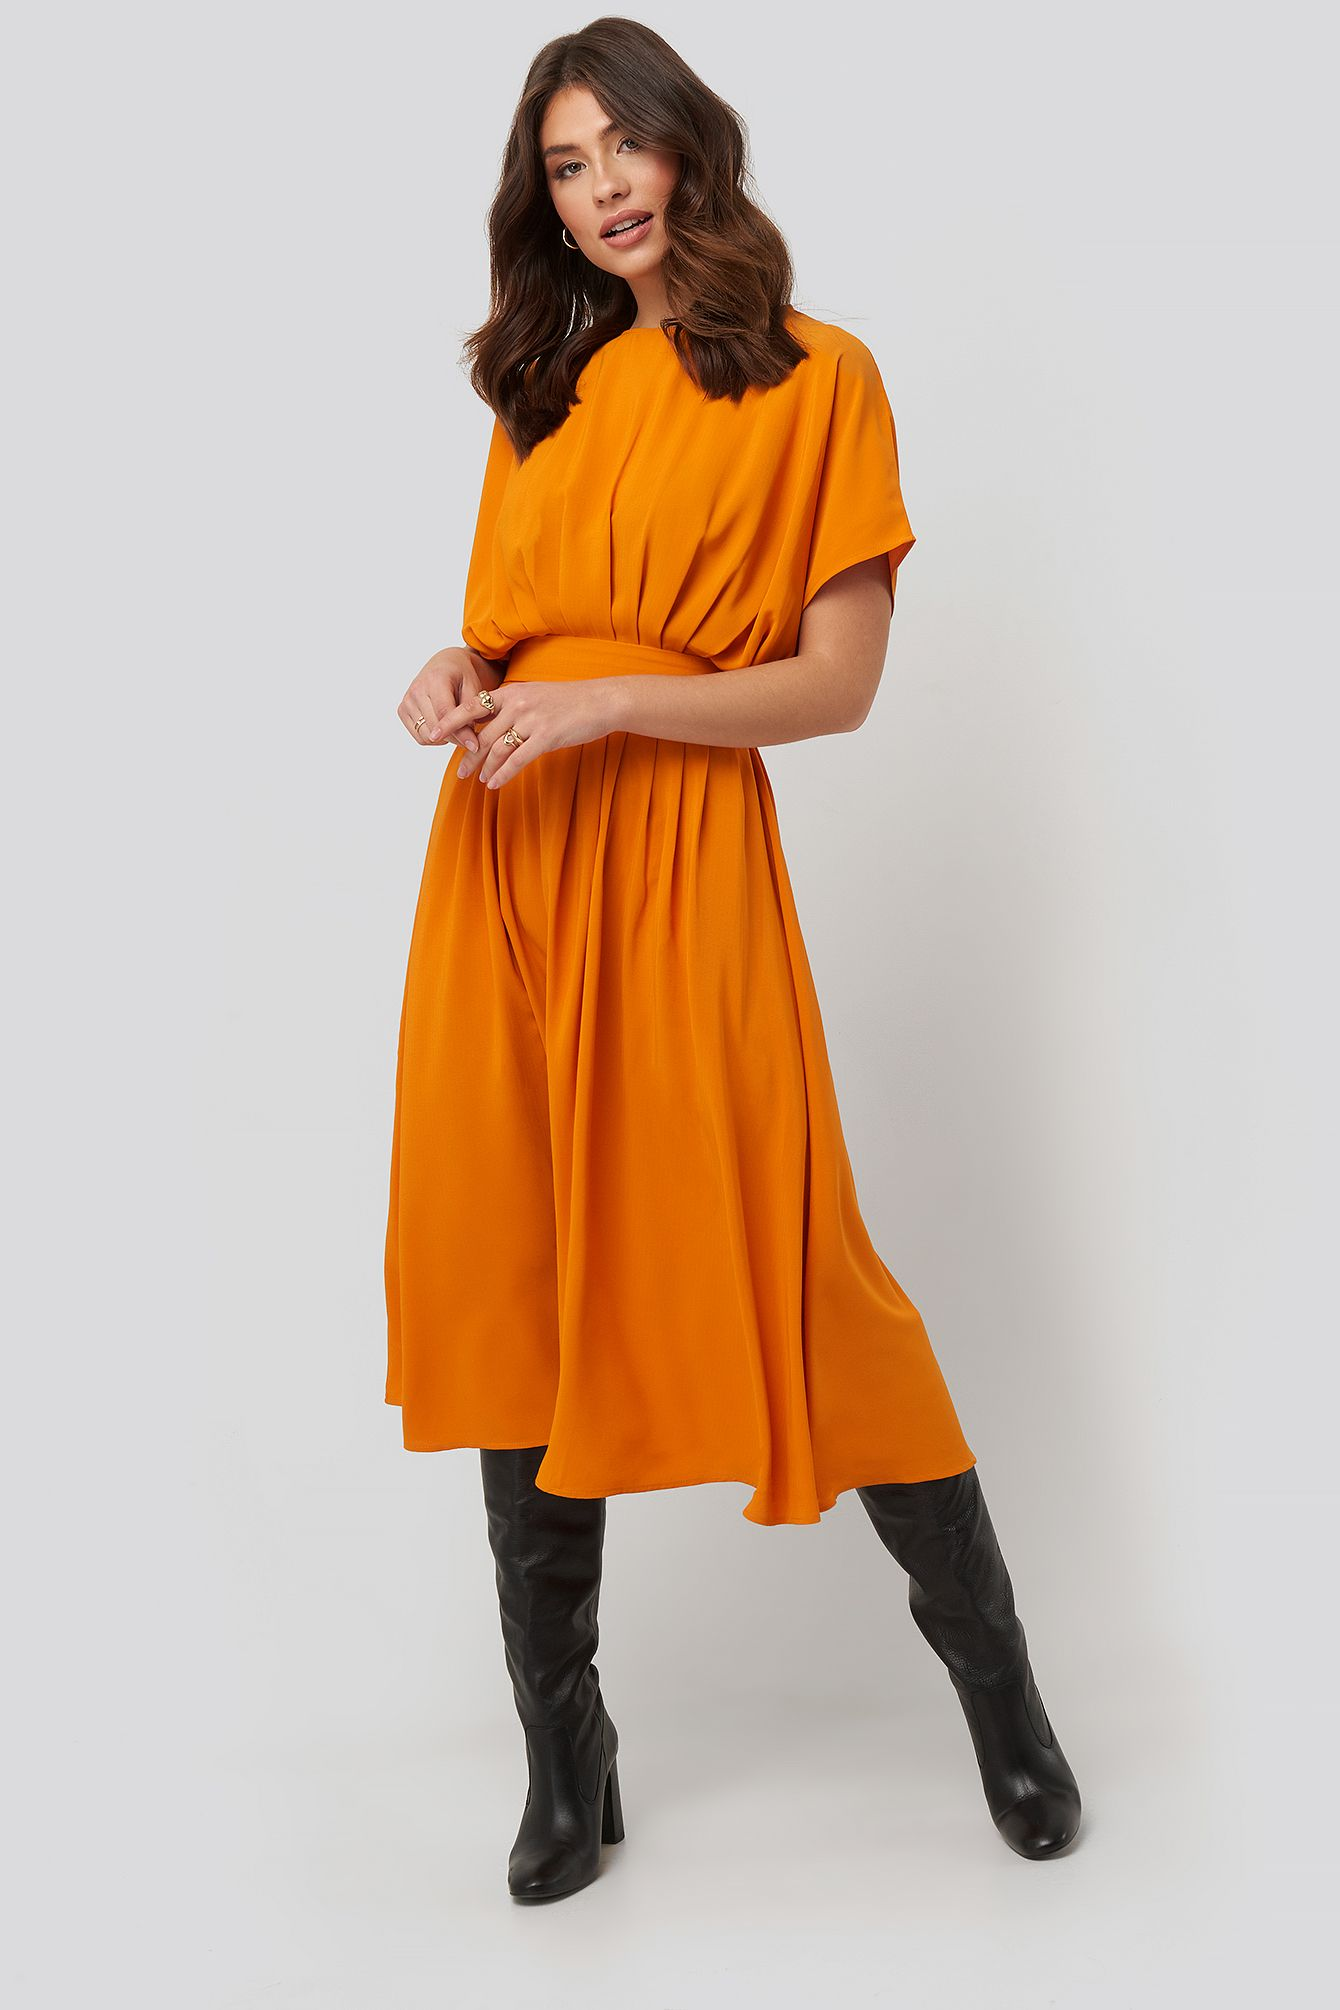 marked waist dress orange in mustard | waist dress, dresses